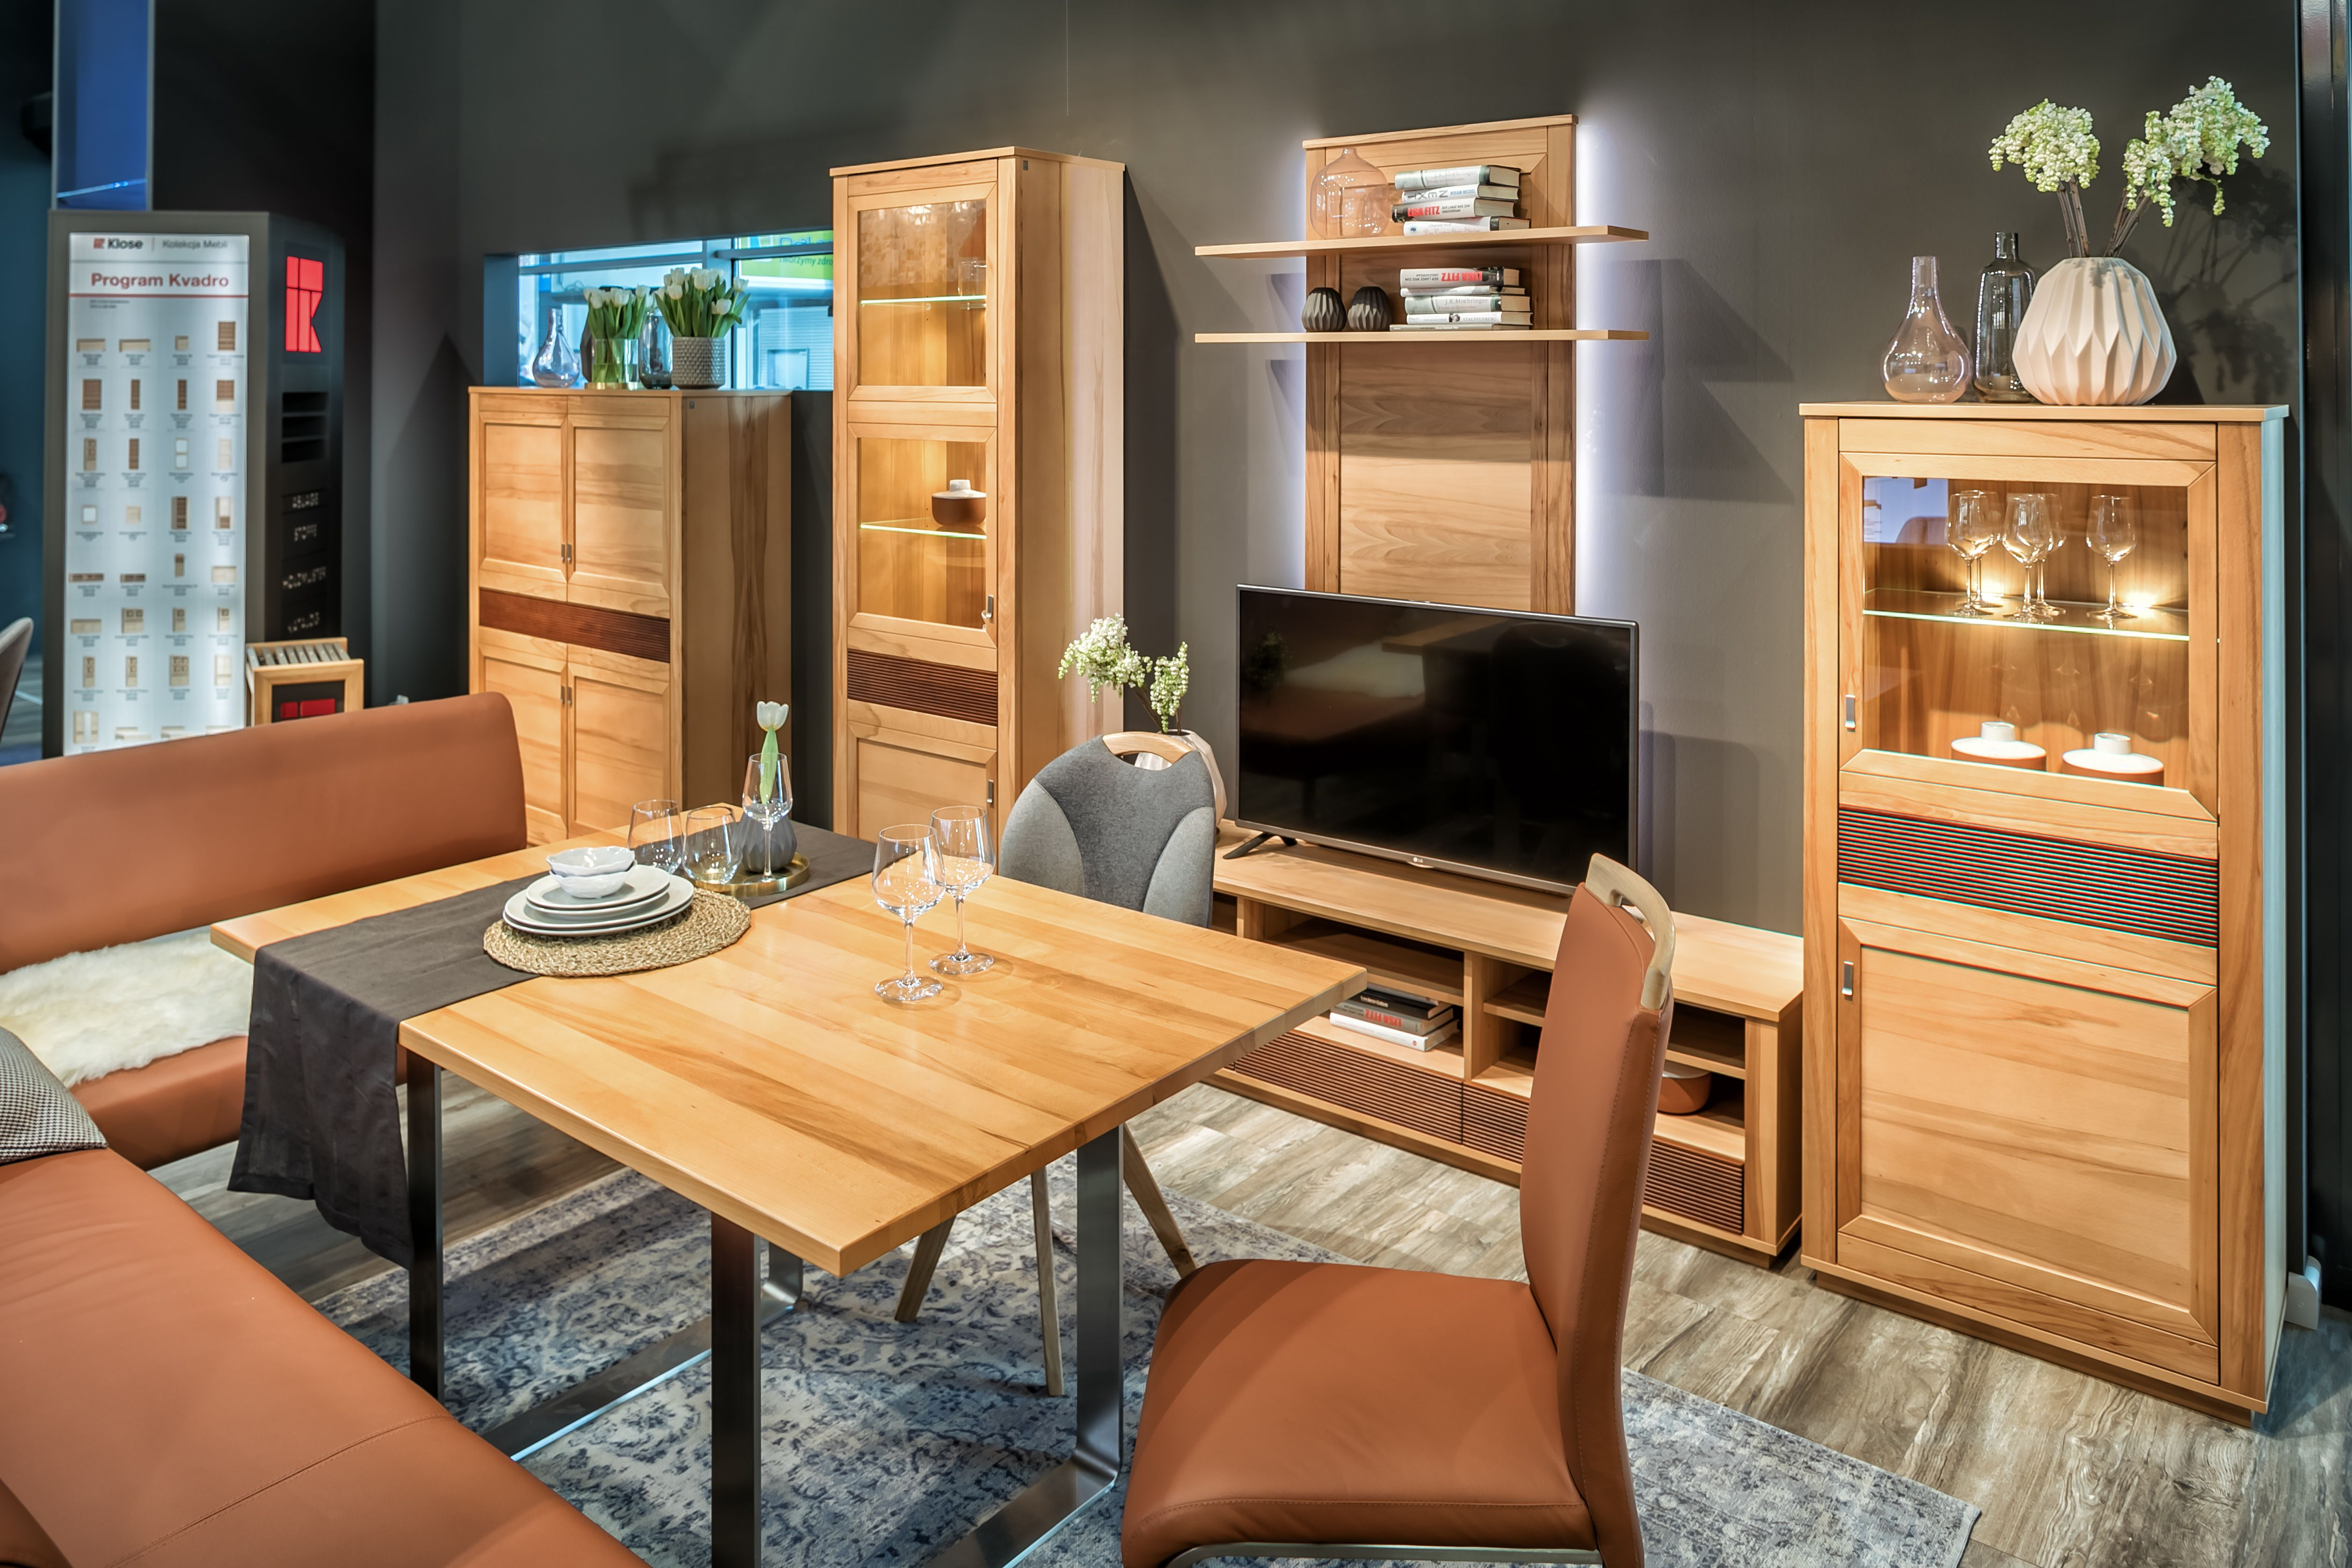 Explore Interior Ideas  Furniture  and more  Kvadro Home Concept. Kvadro Home Concept   new interior idea from Klose  KloseFurniture